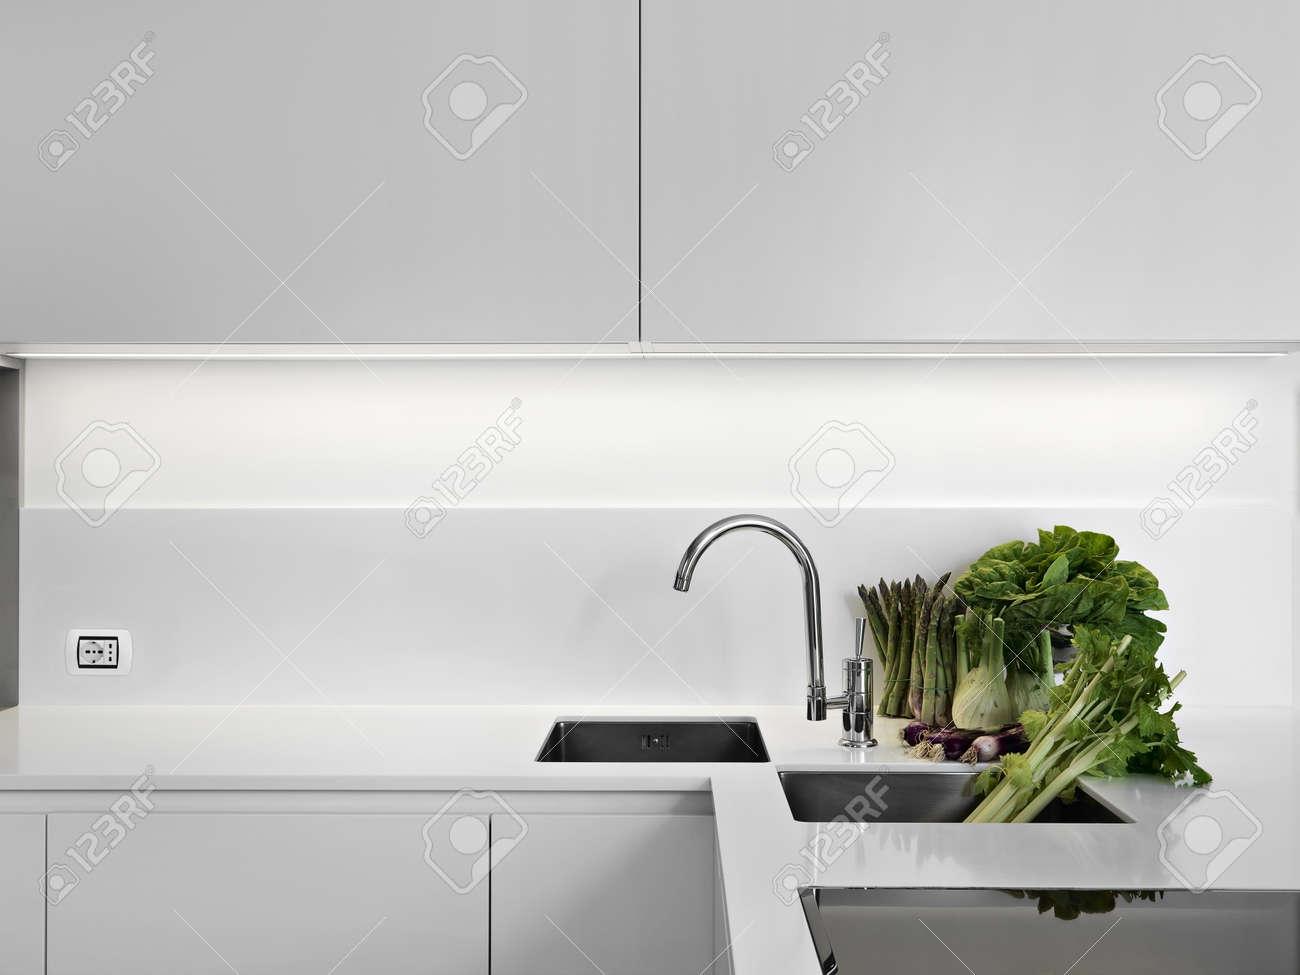 Modern White Laminate Kitchen With Vegetables On The White Worktop ...